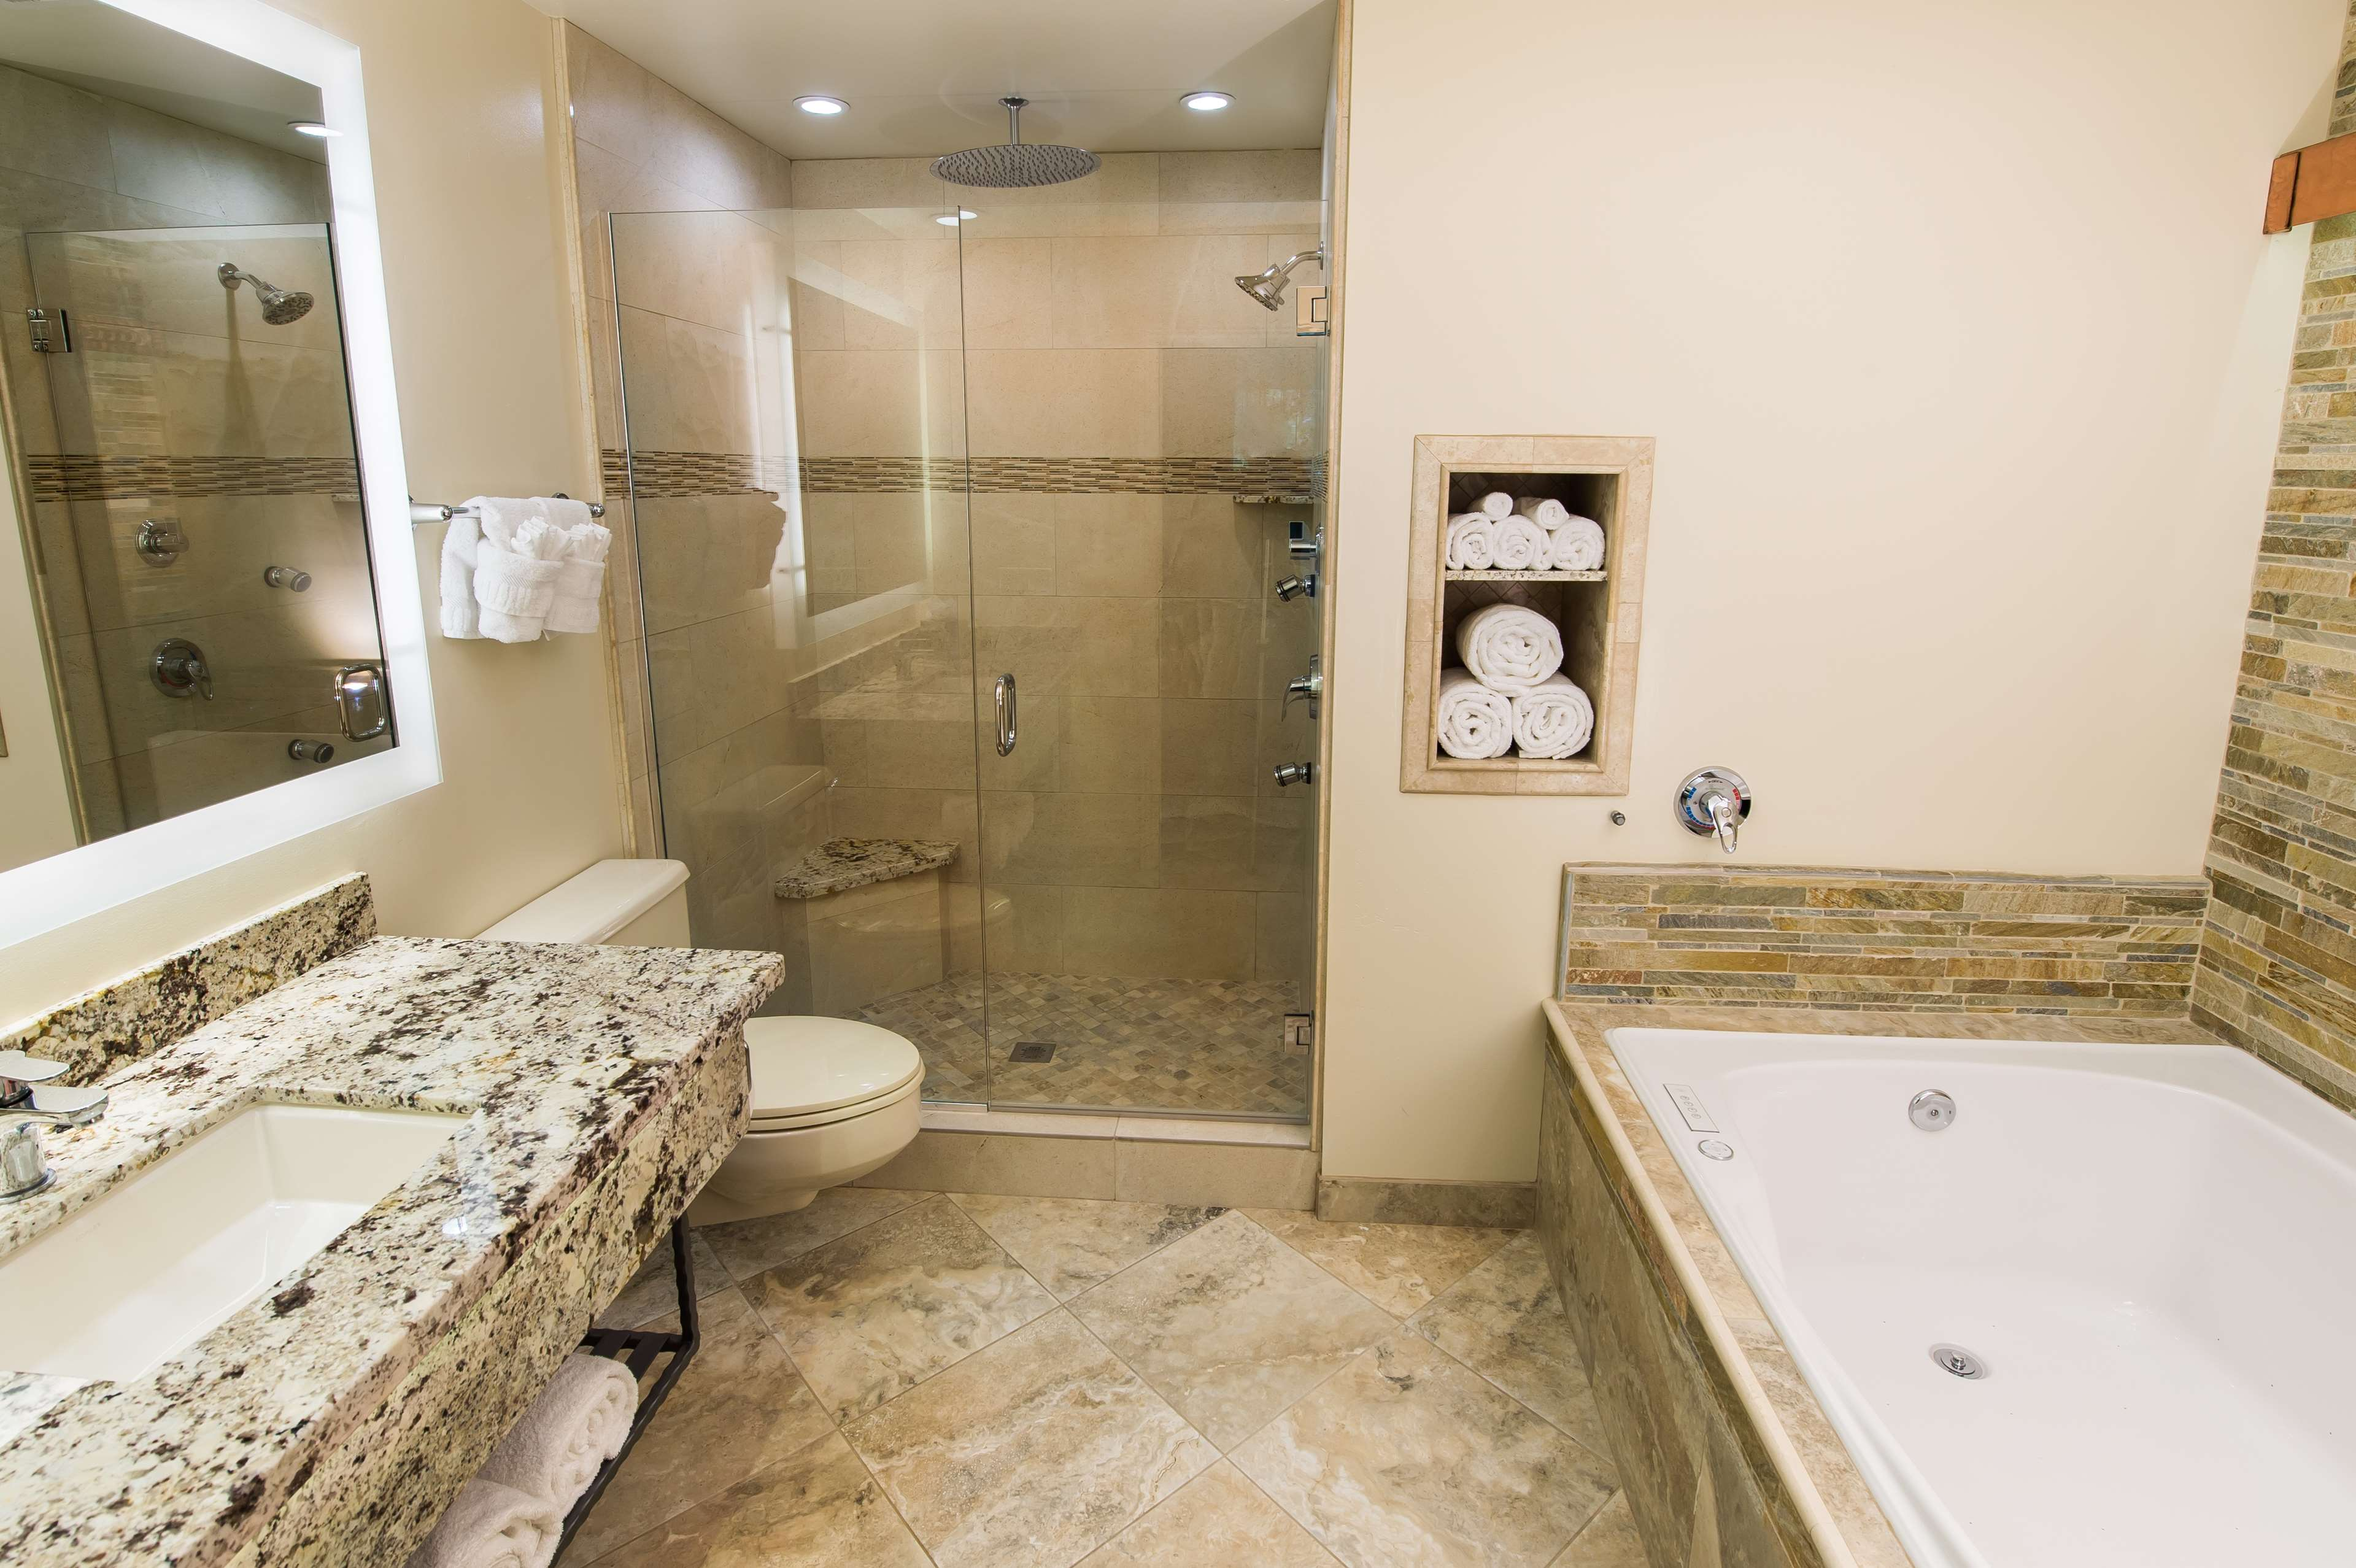 Best Western Plus Arroyo Roble Hotel & Creekside Villas image 30